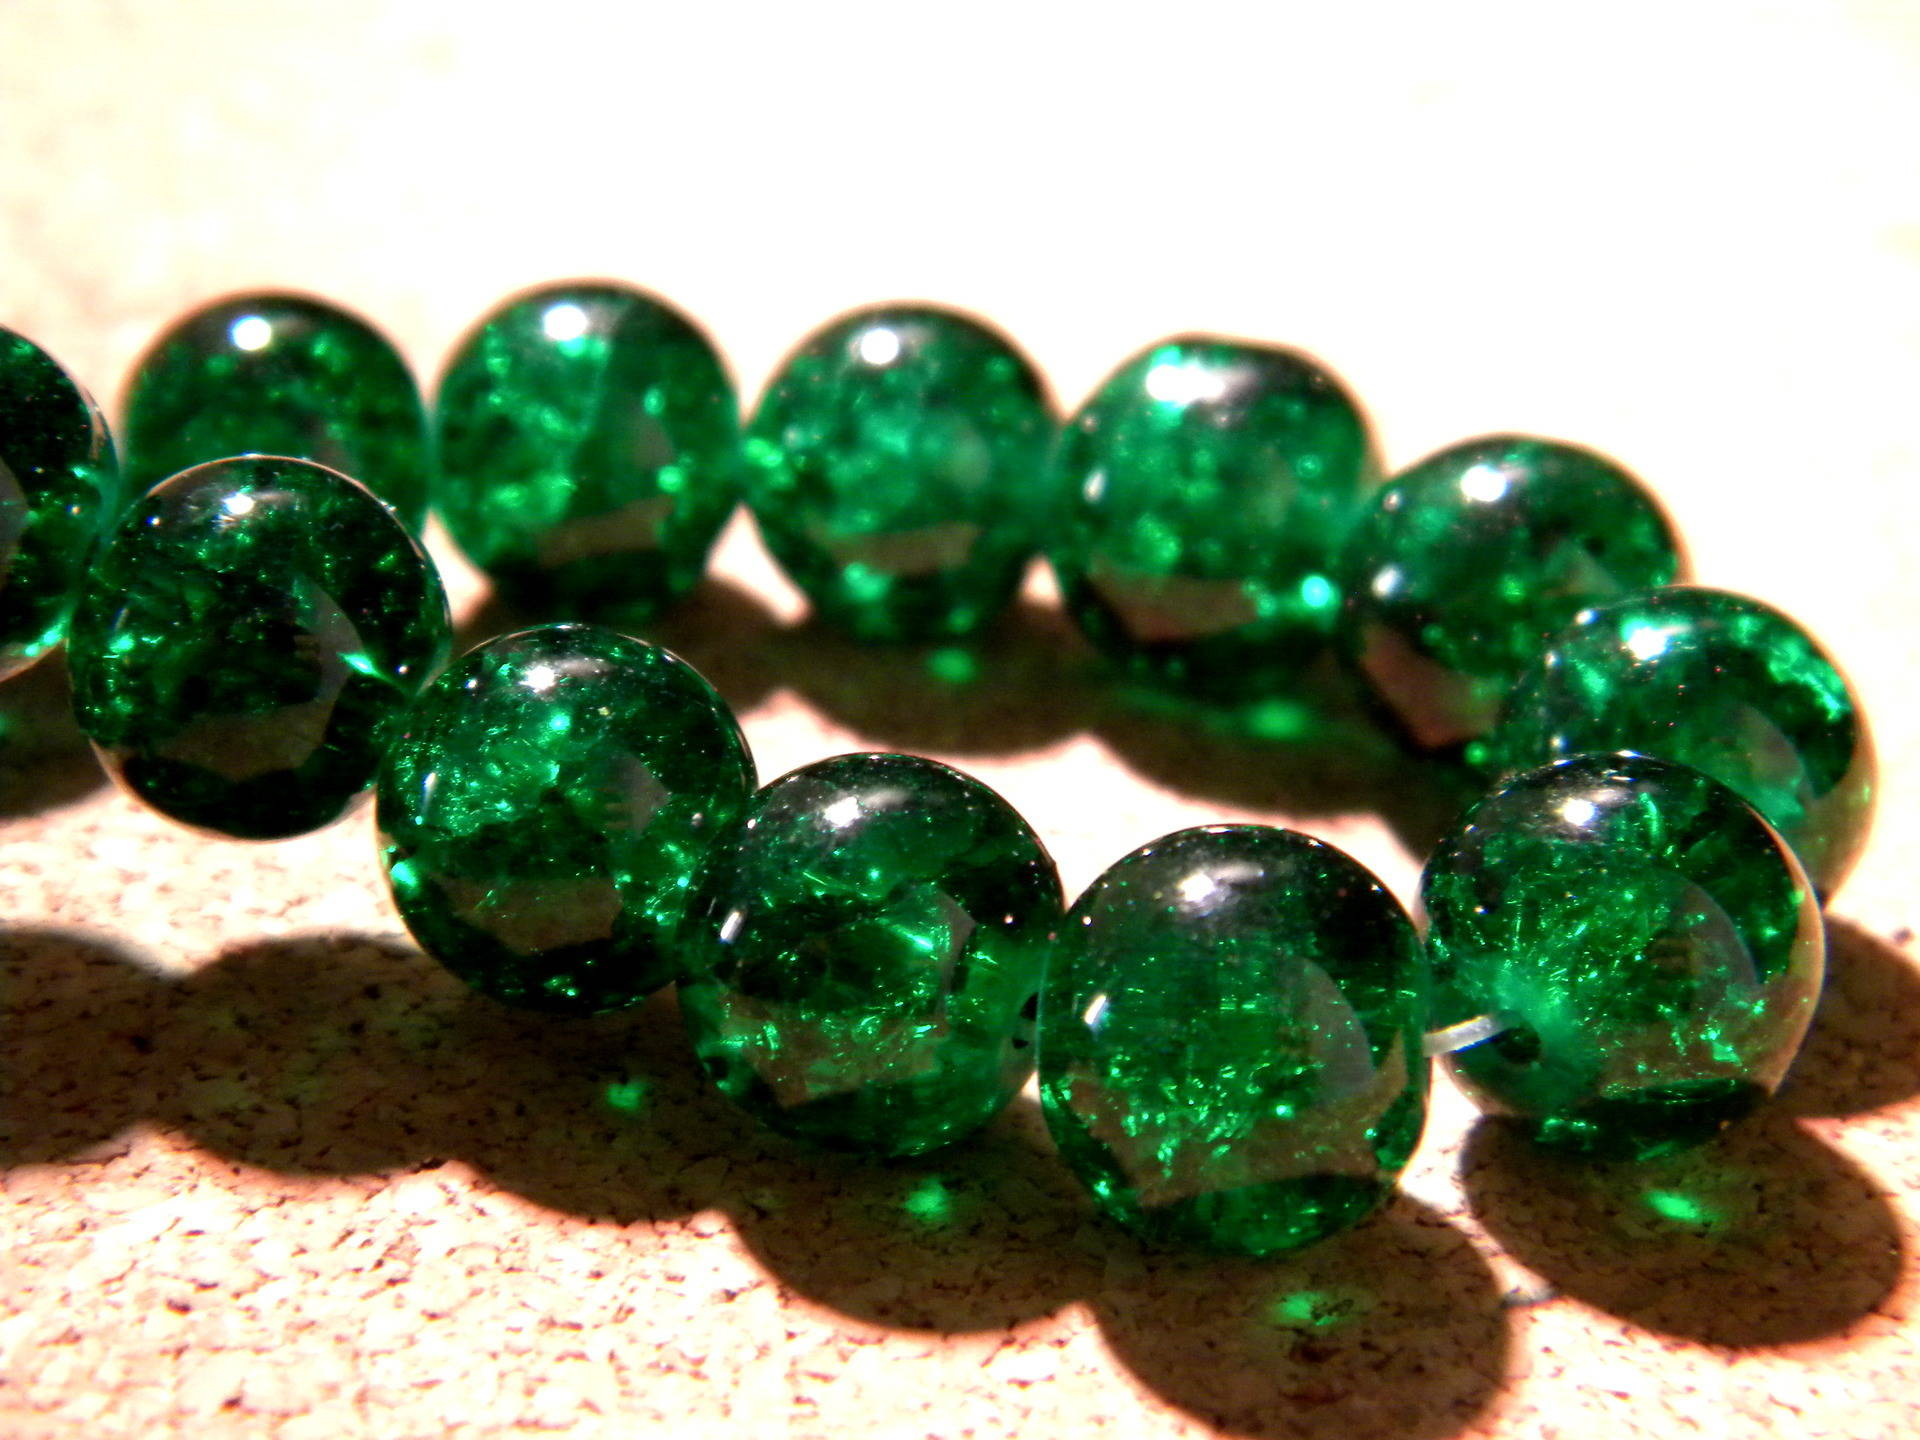 fabrication de bijoux 10mm perles de verre craquelé-violet foncé 40 perles